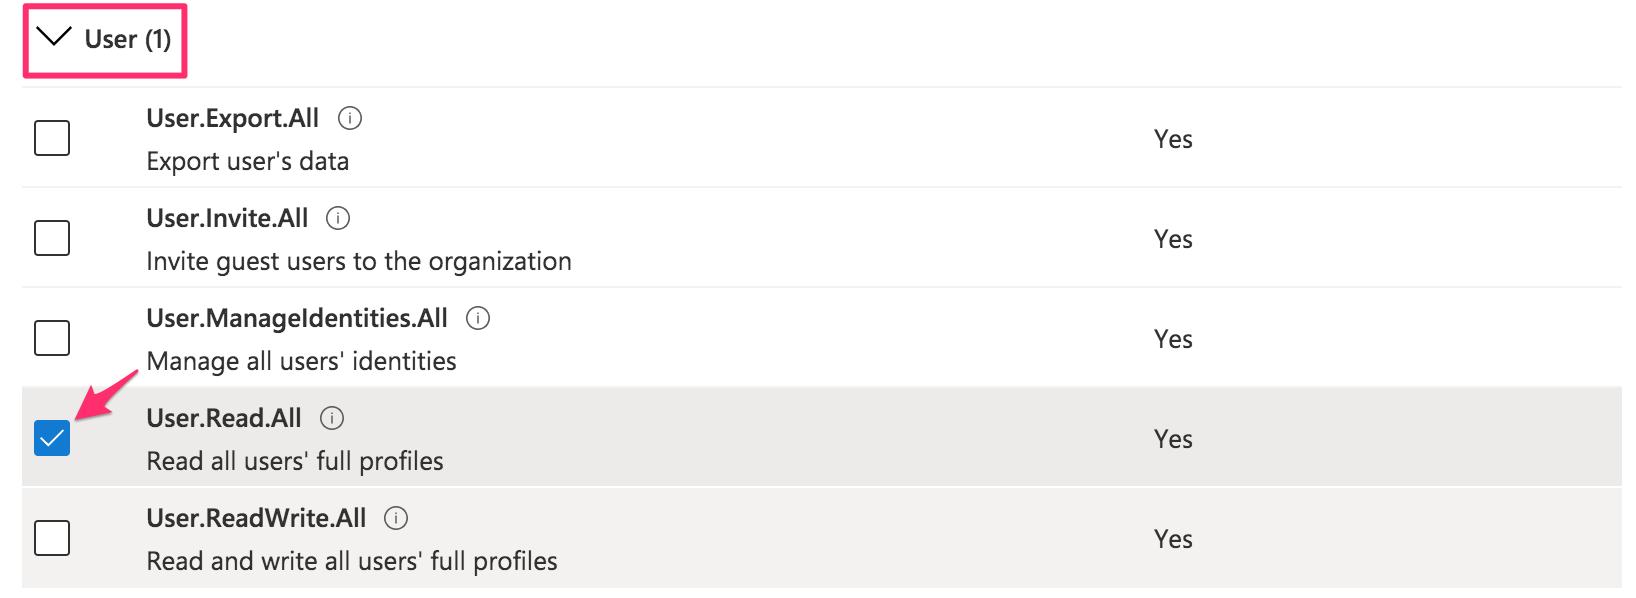 Request_API_permissions_-_Azure_Active_Directory_admin_center-11.png